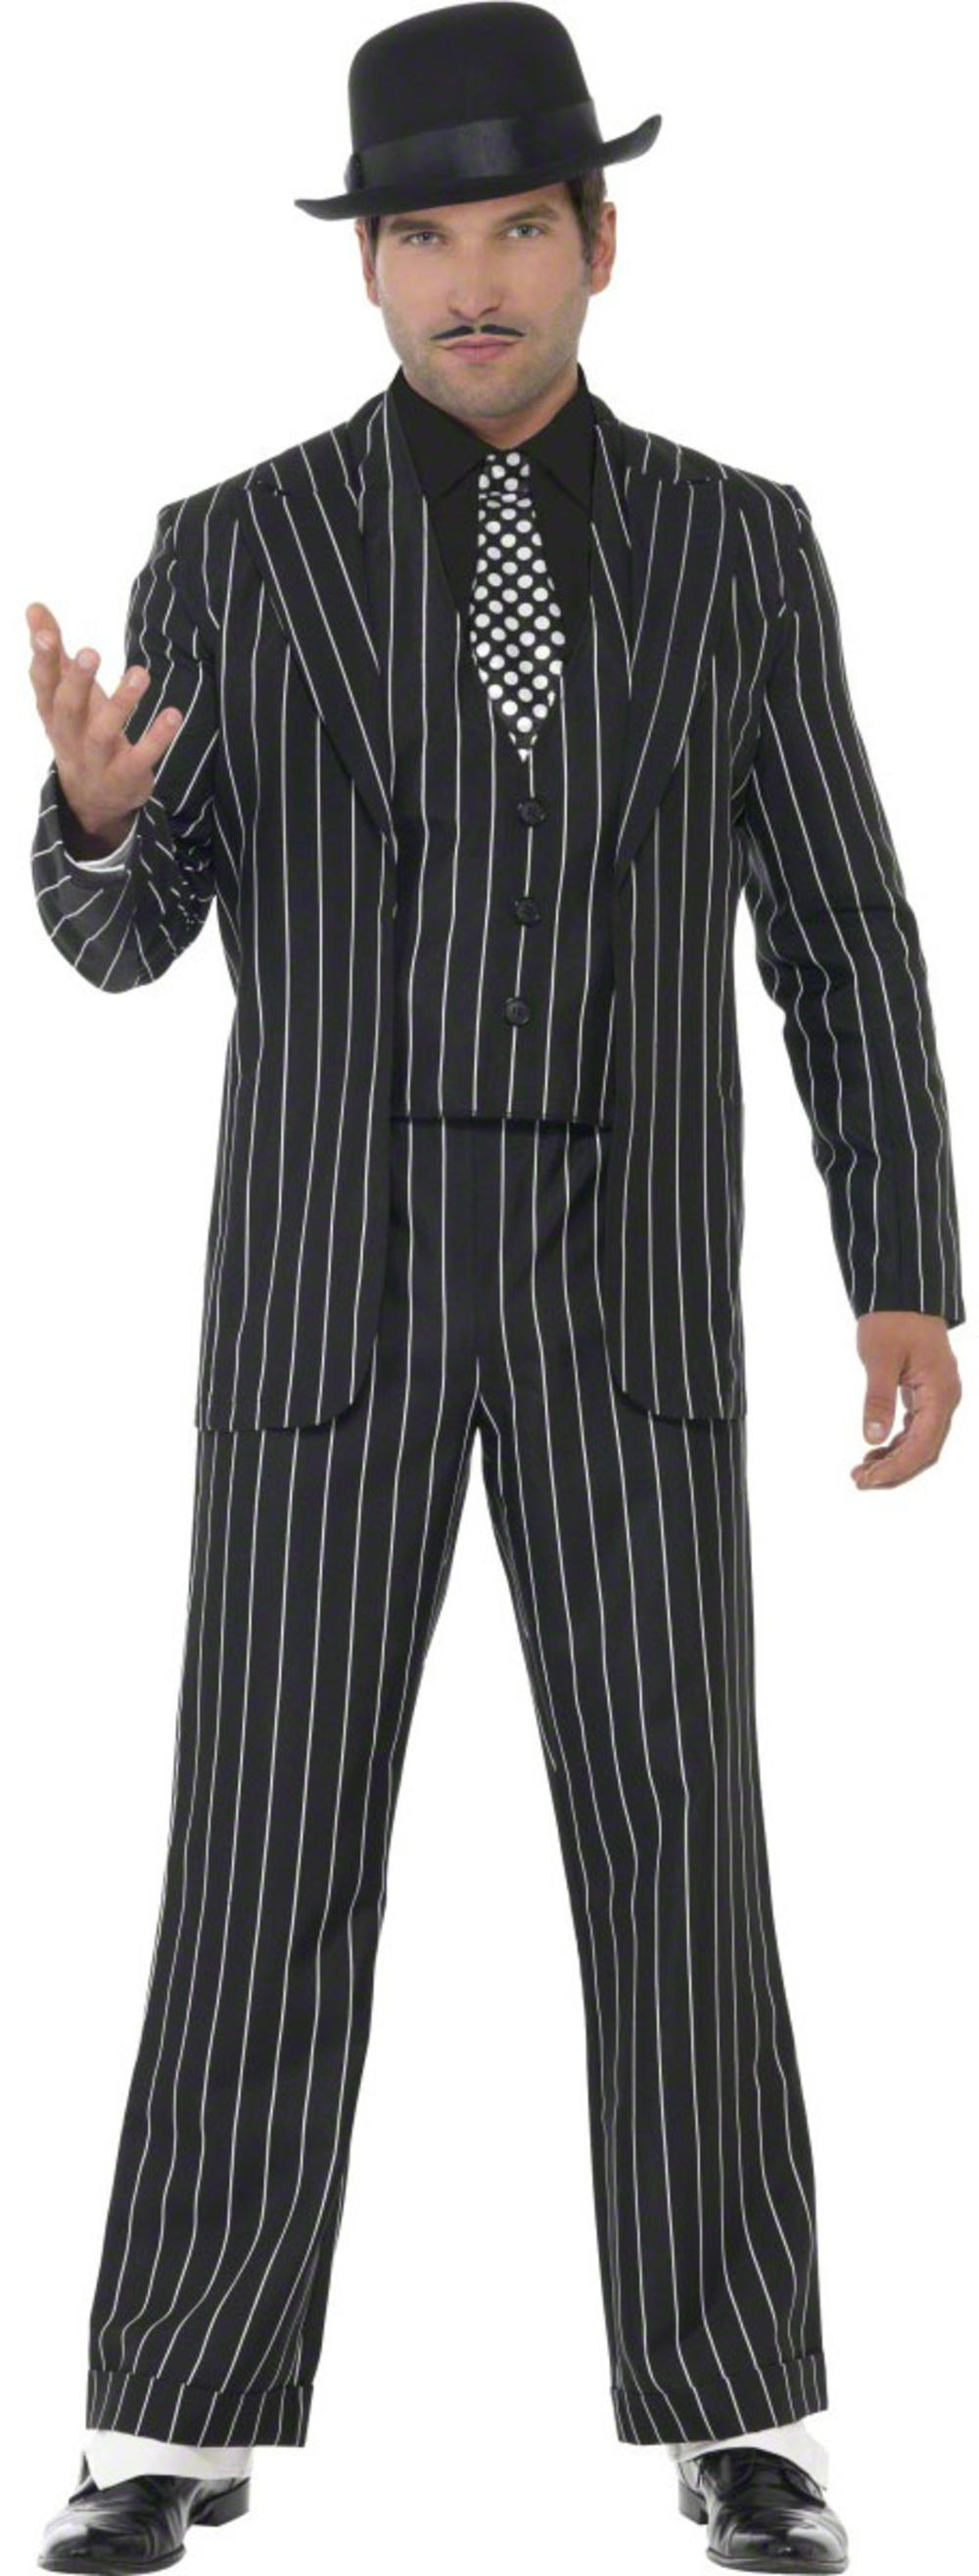 Vintage Gangster Boss Suit Mens Fancy Dress 1920s Costume 20s Mafia Outfit New